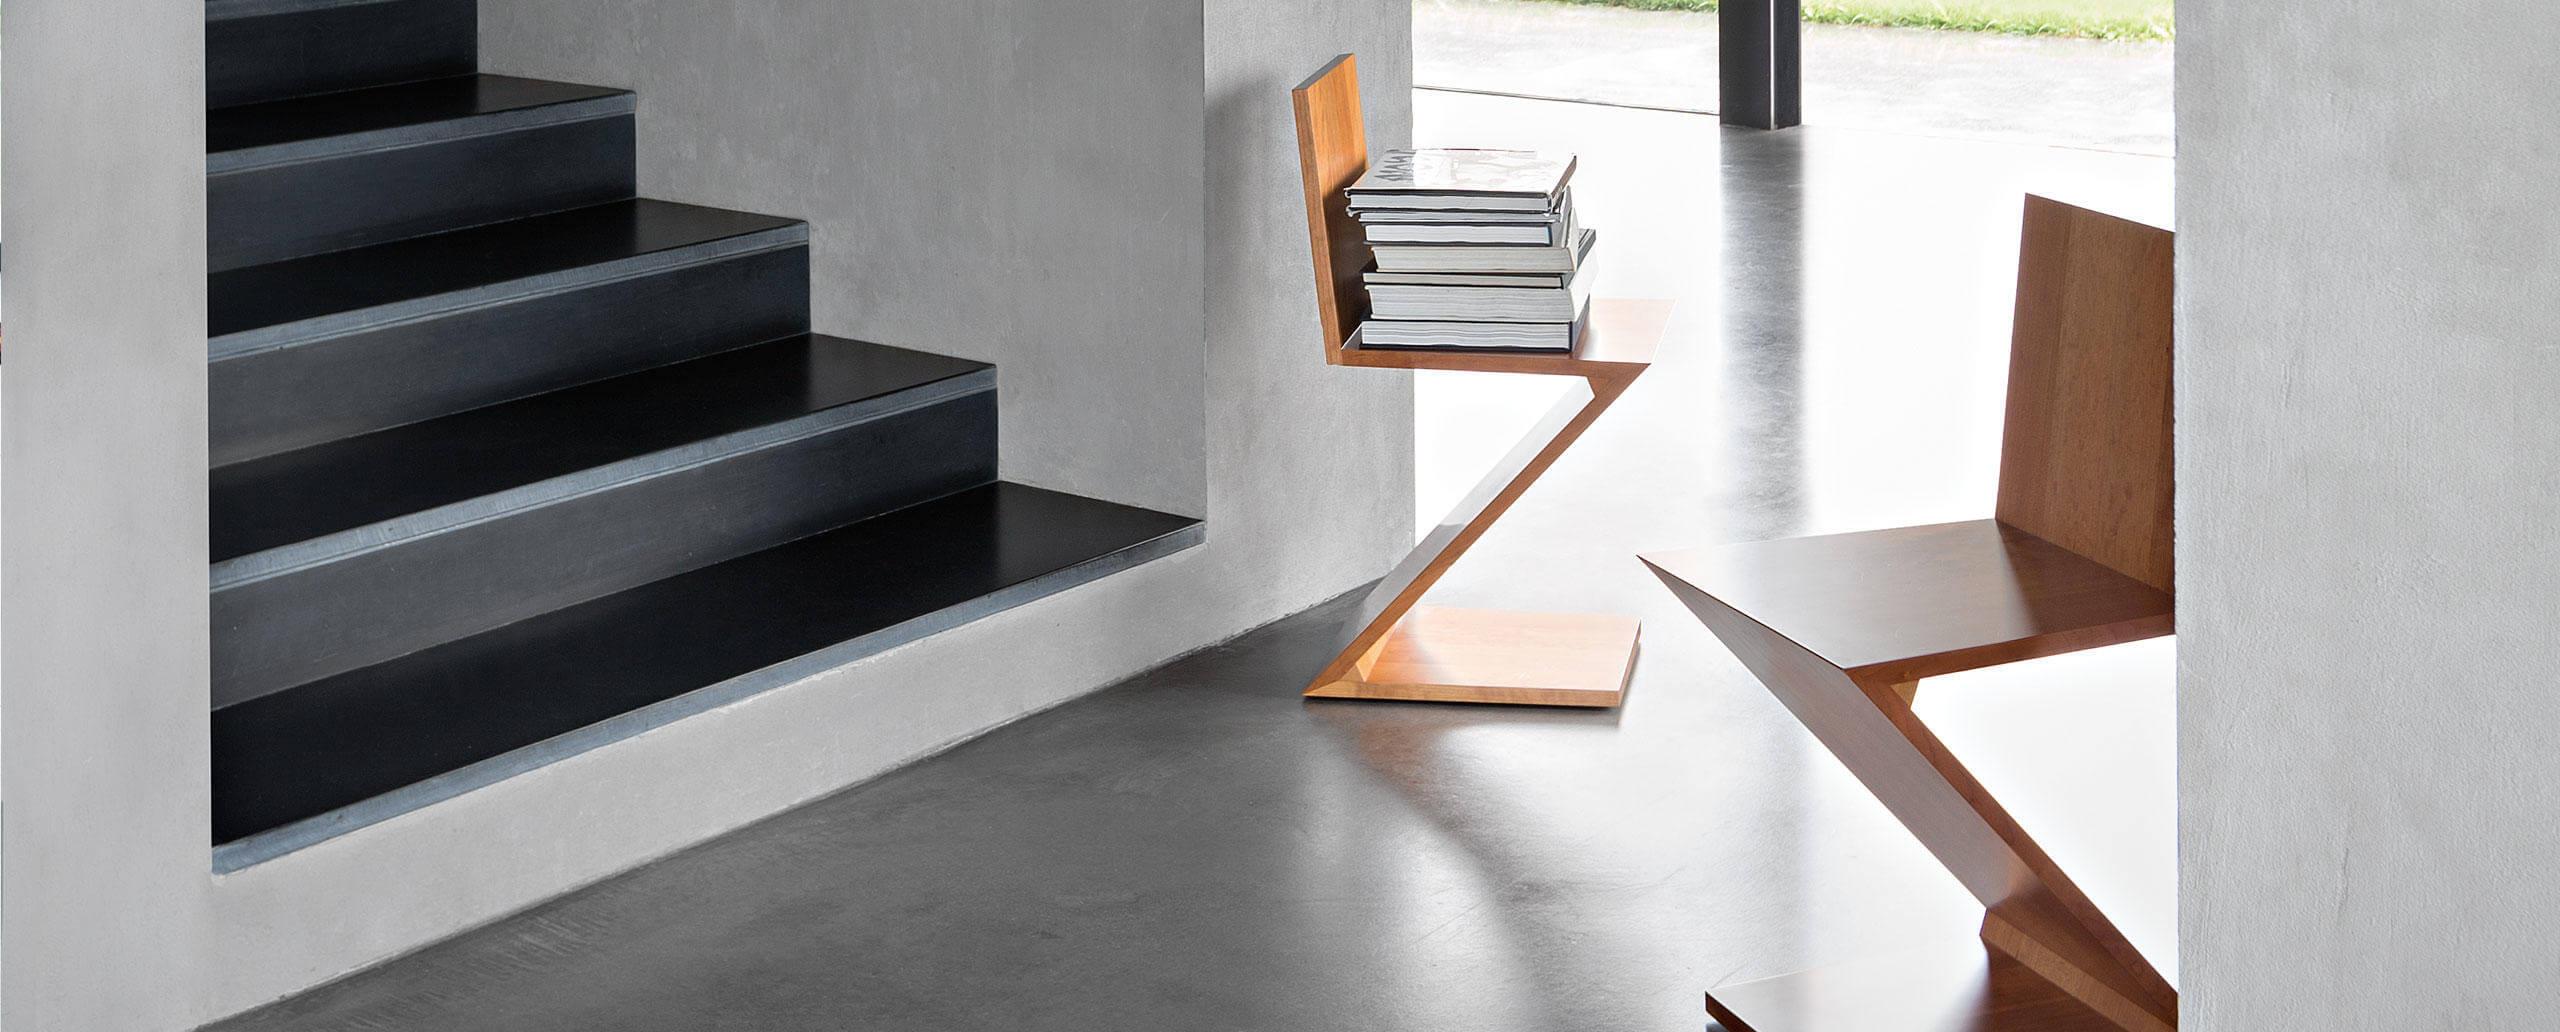 La silla Zig Zag de Gerrit Rietveld